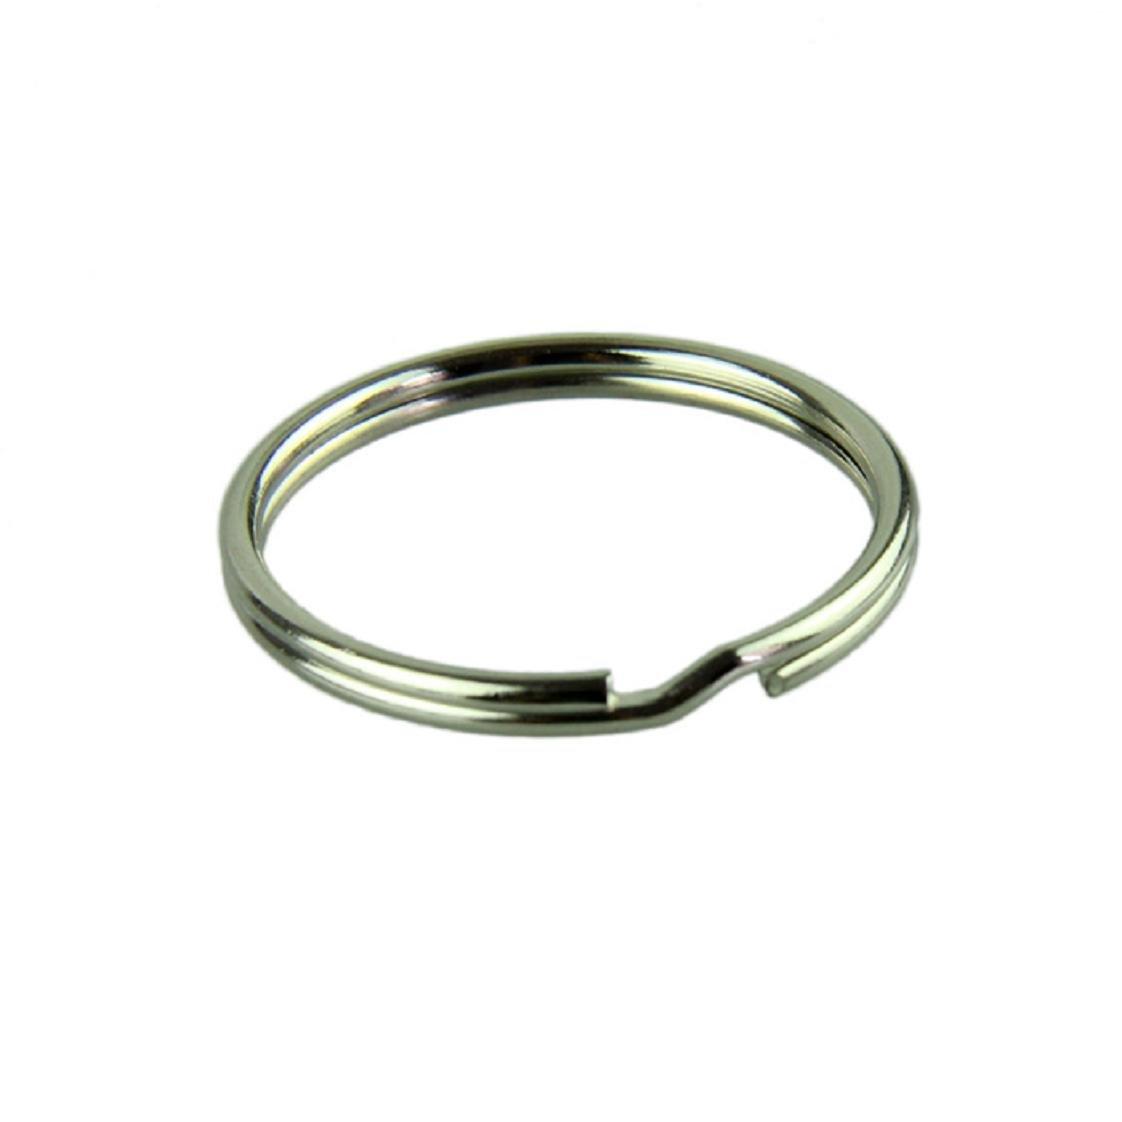 37df5de431 Amazon.com: Mchoice 50pcs KeyRing Kay Chain 25mm Round Split Key Rings  Keychain With Nickel: Clothing